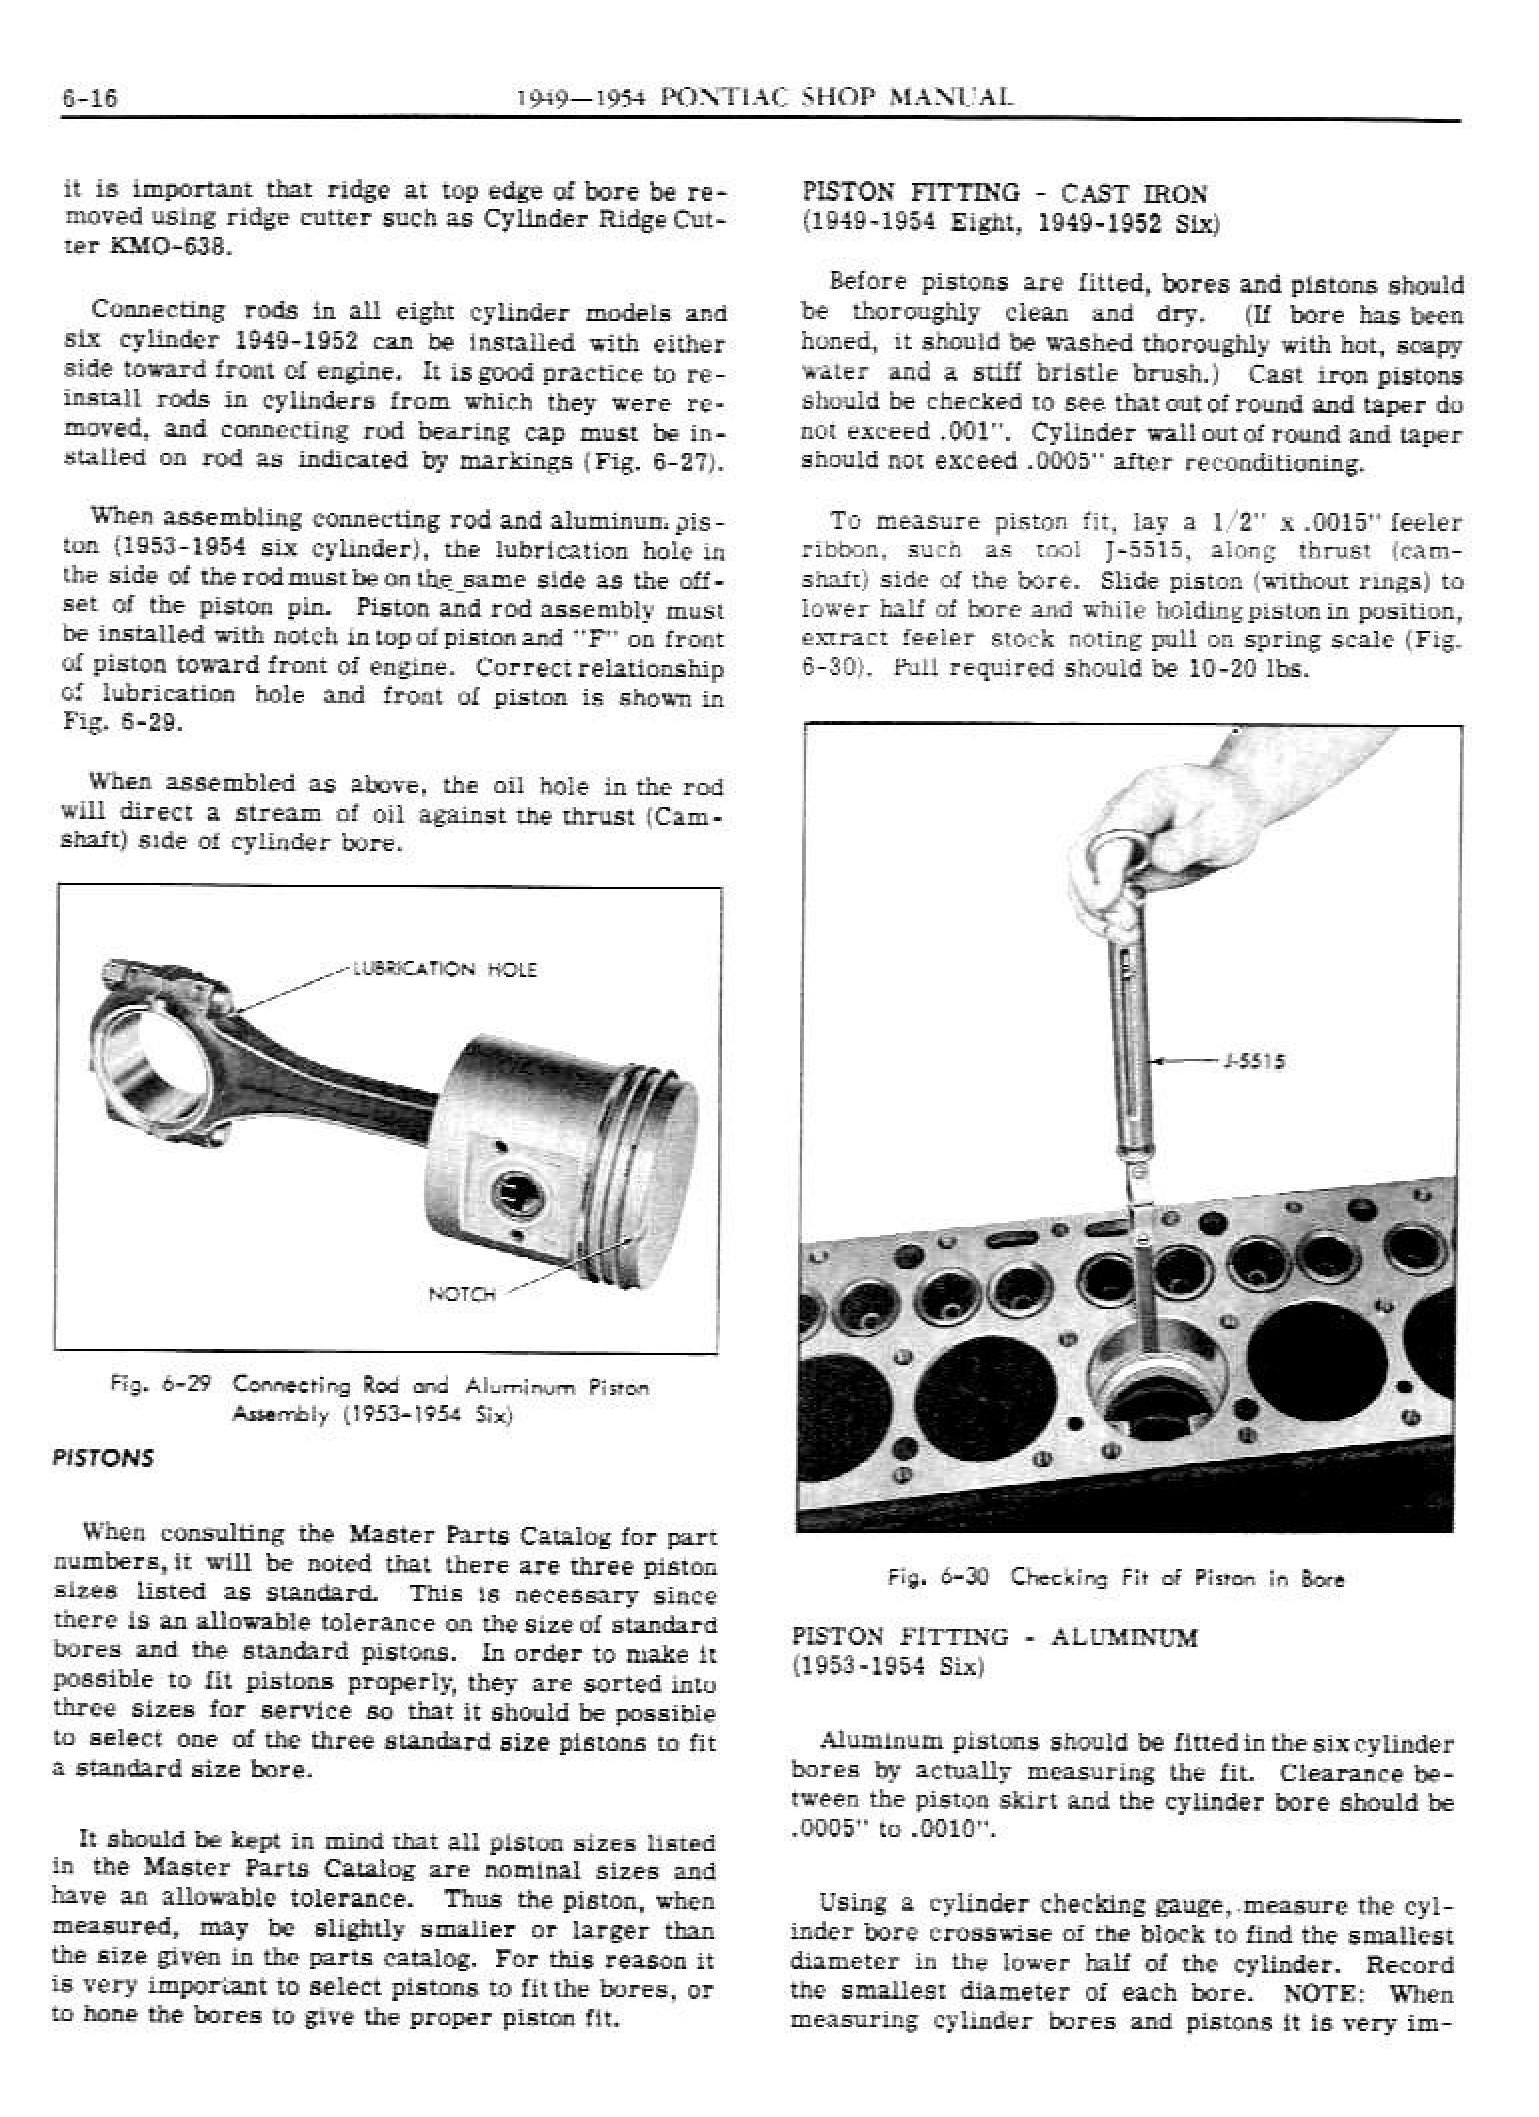 1949 Pontiac Shop Manual- Engine Mechanical Page 16 of 26